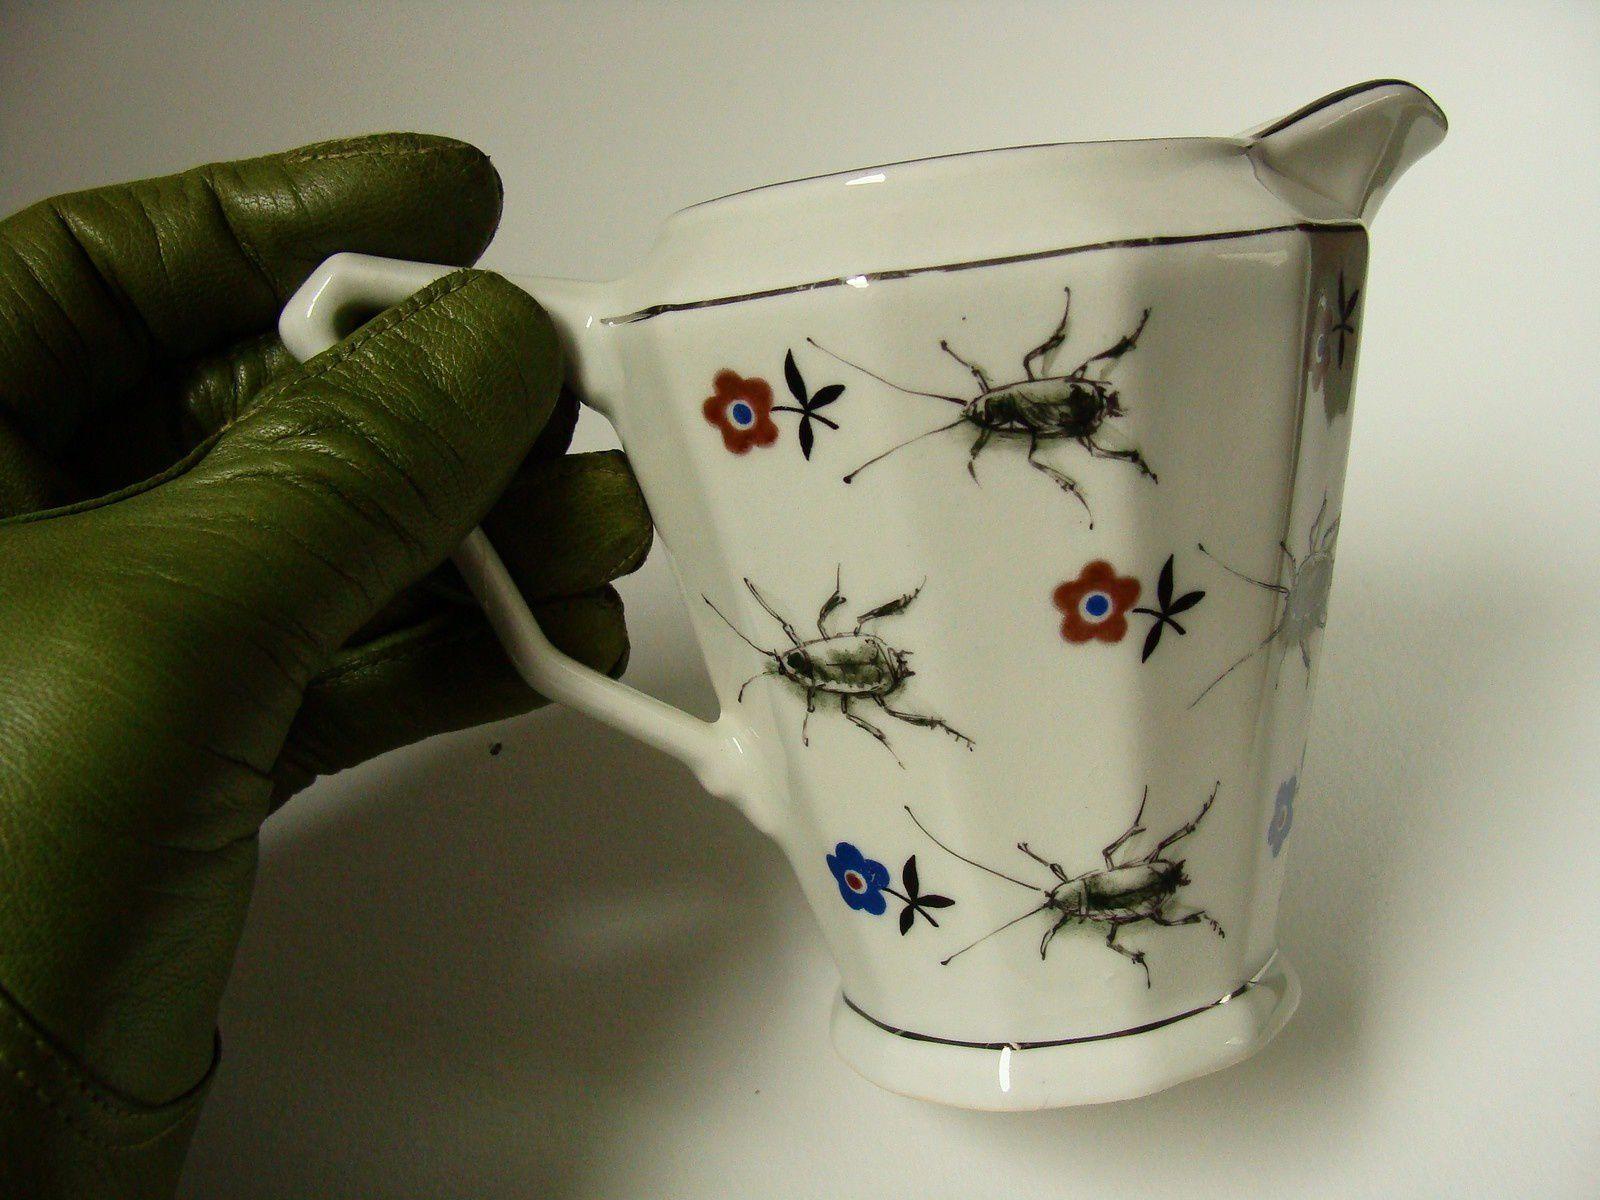 Des blattes